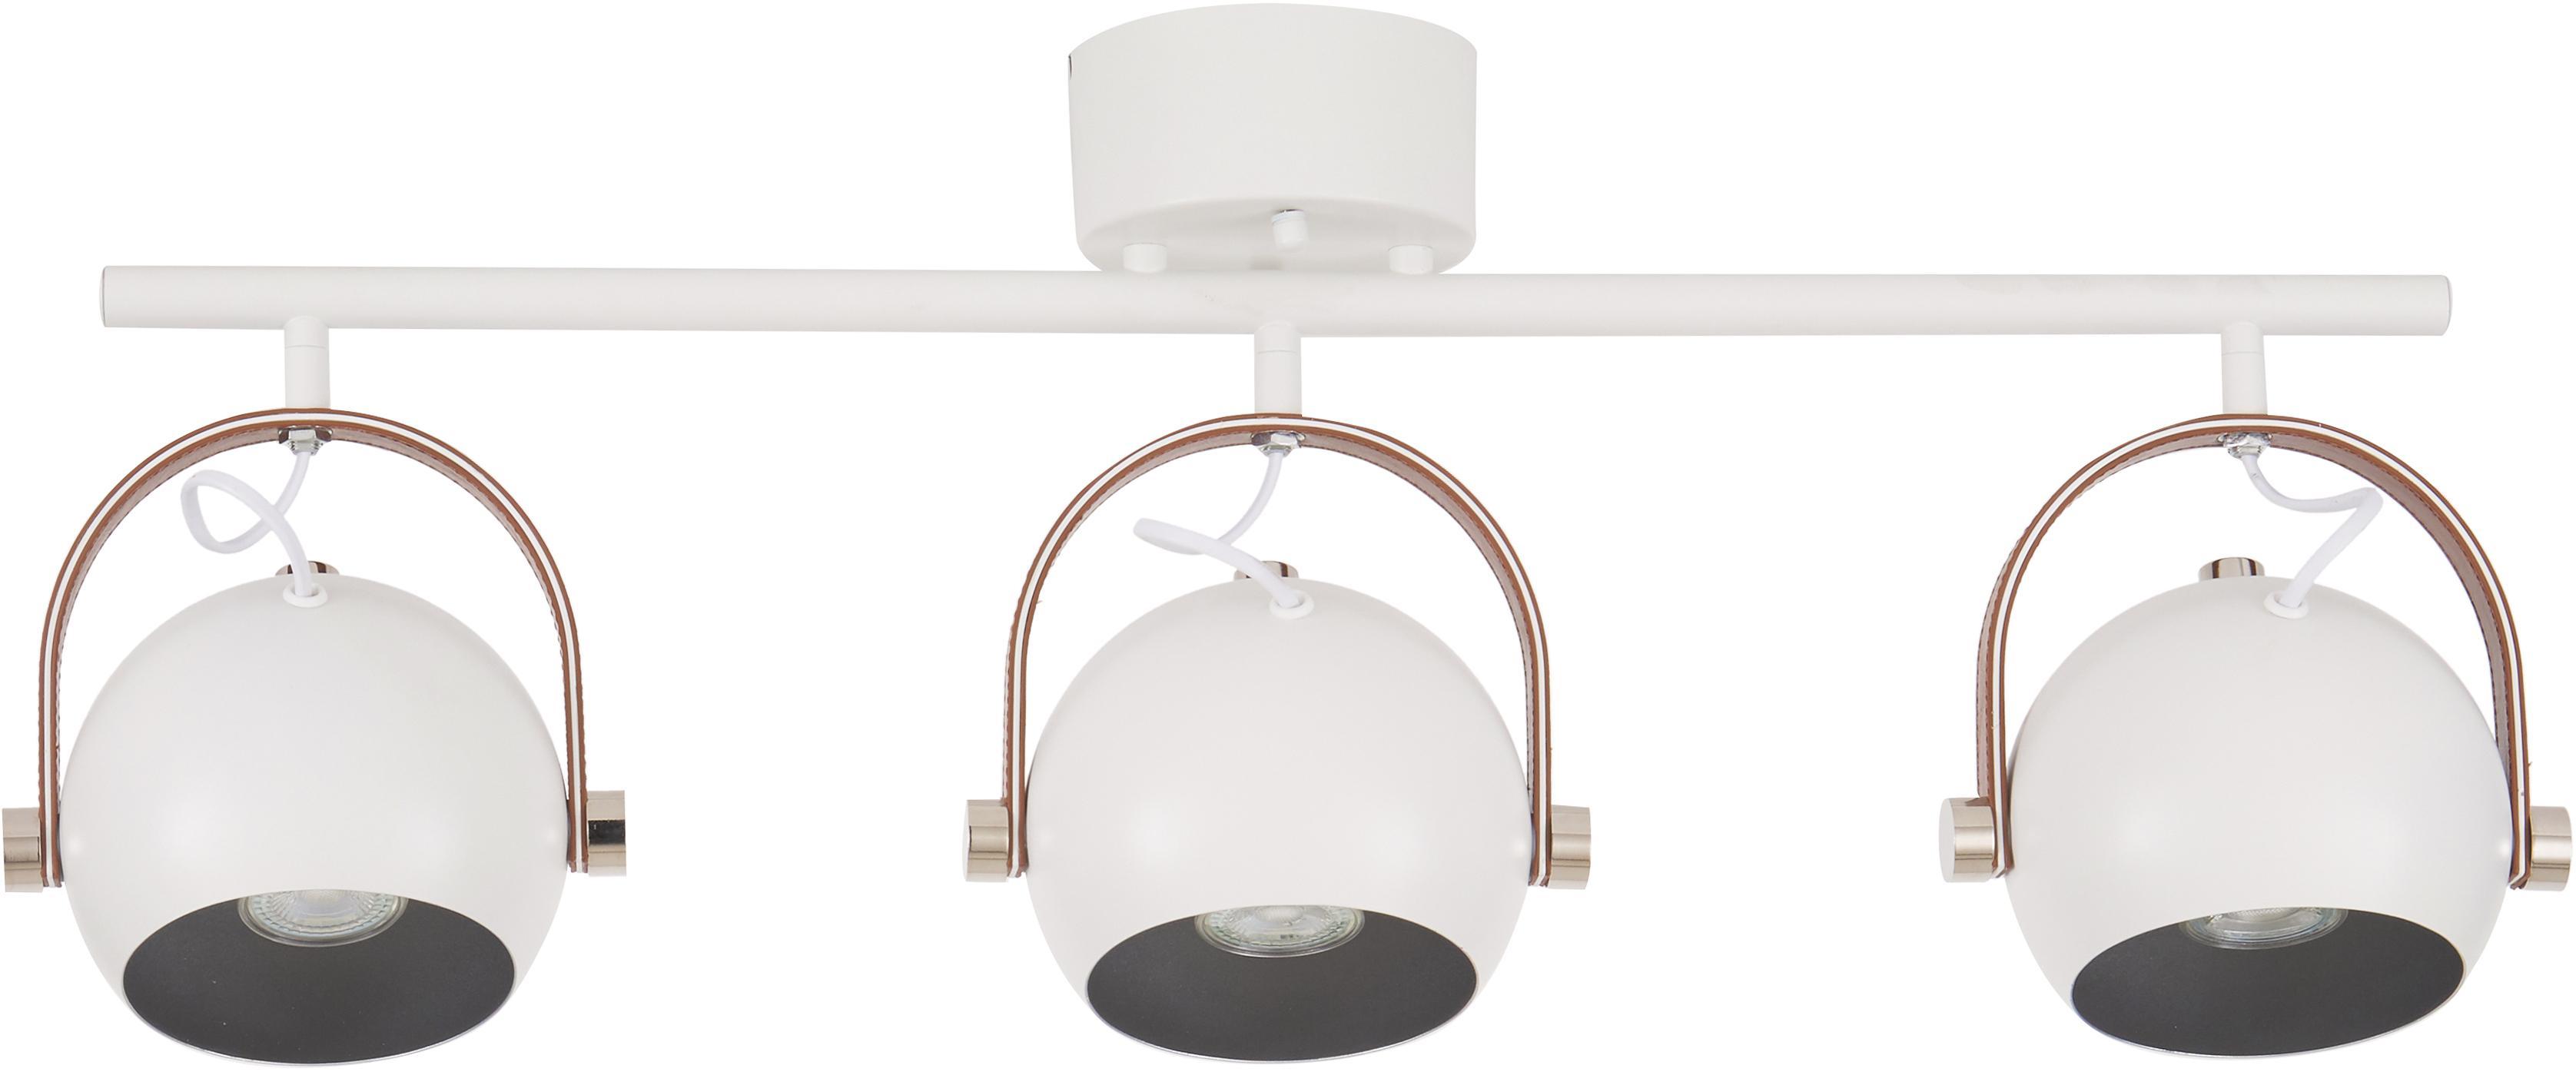 Faretti da soffitto industrial Bow, Bianco, Larg. 76 x Alt. 28 cm